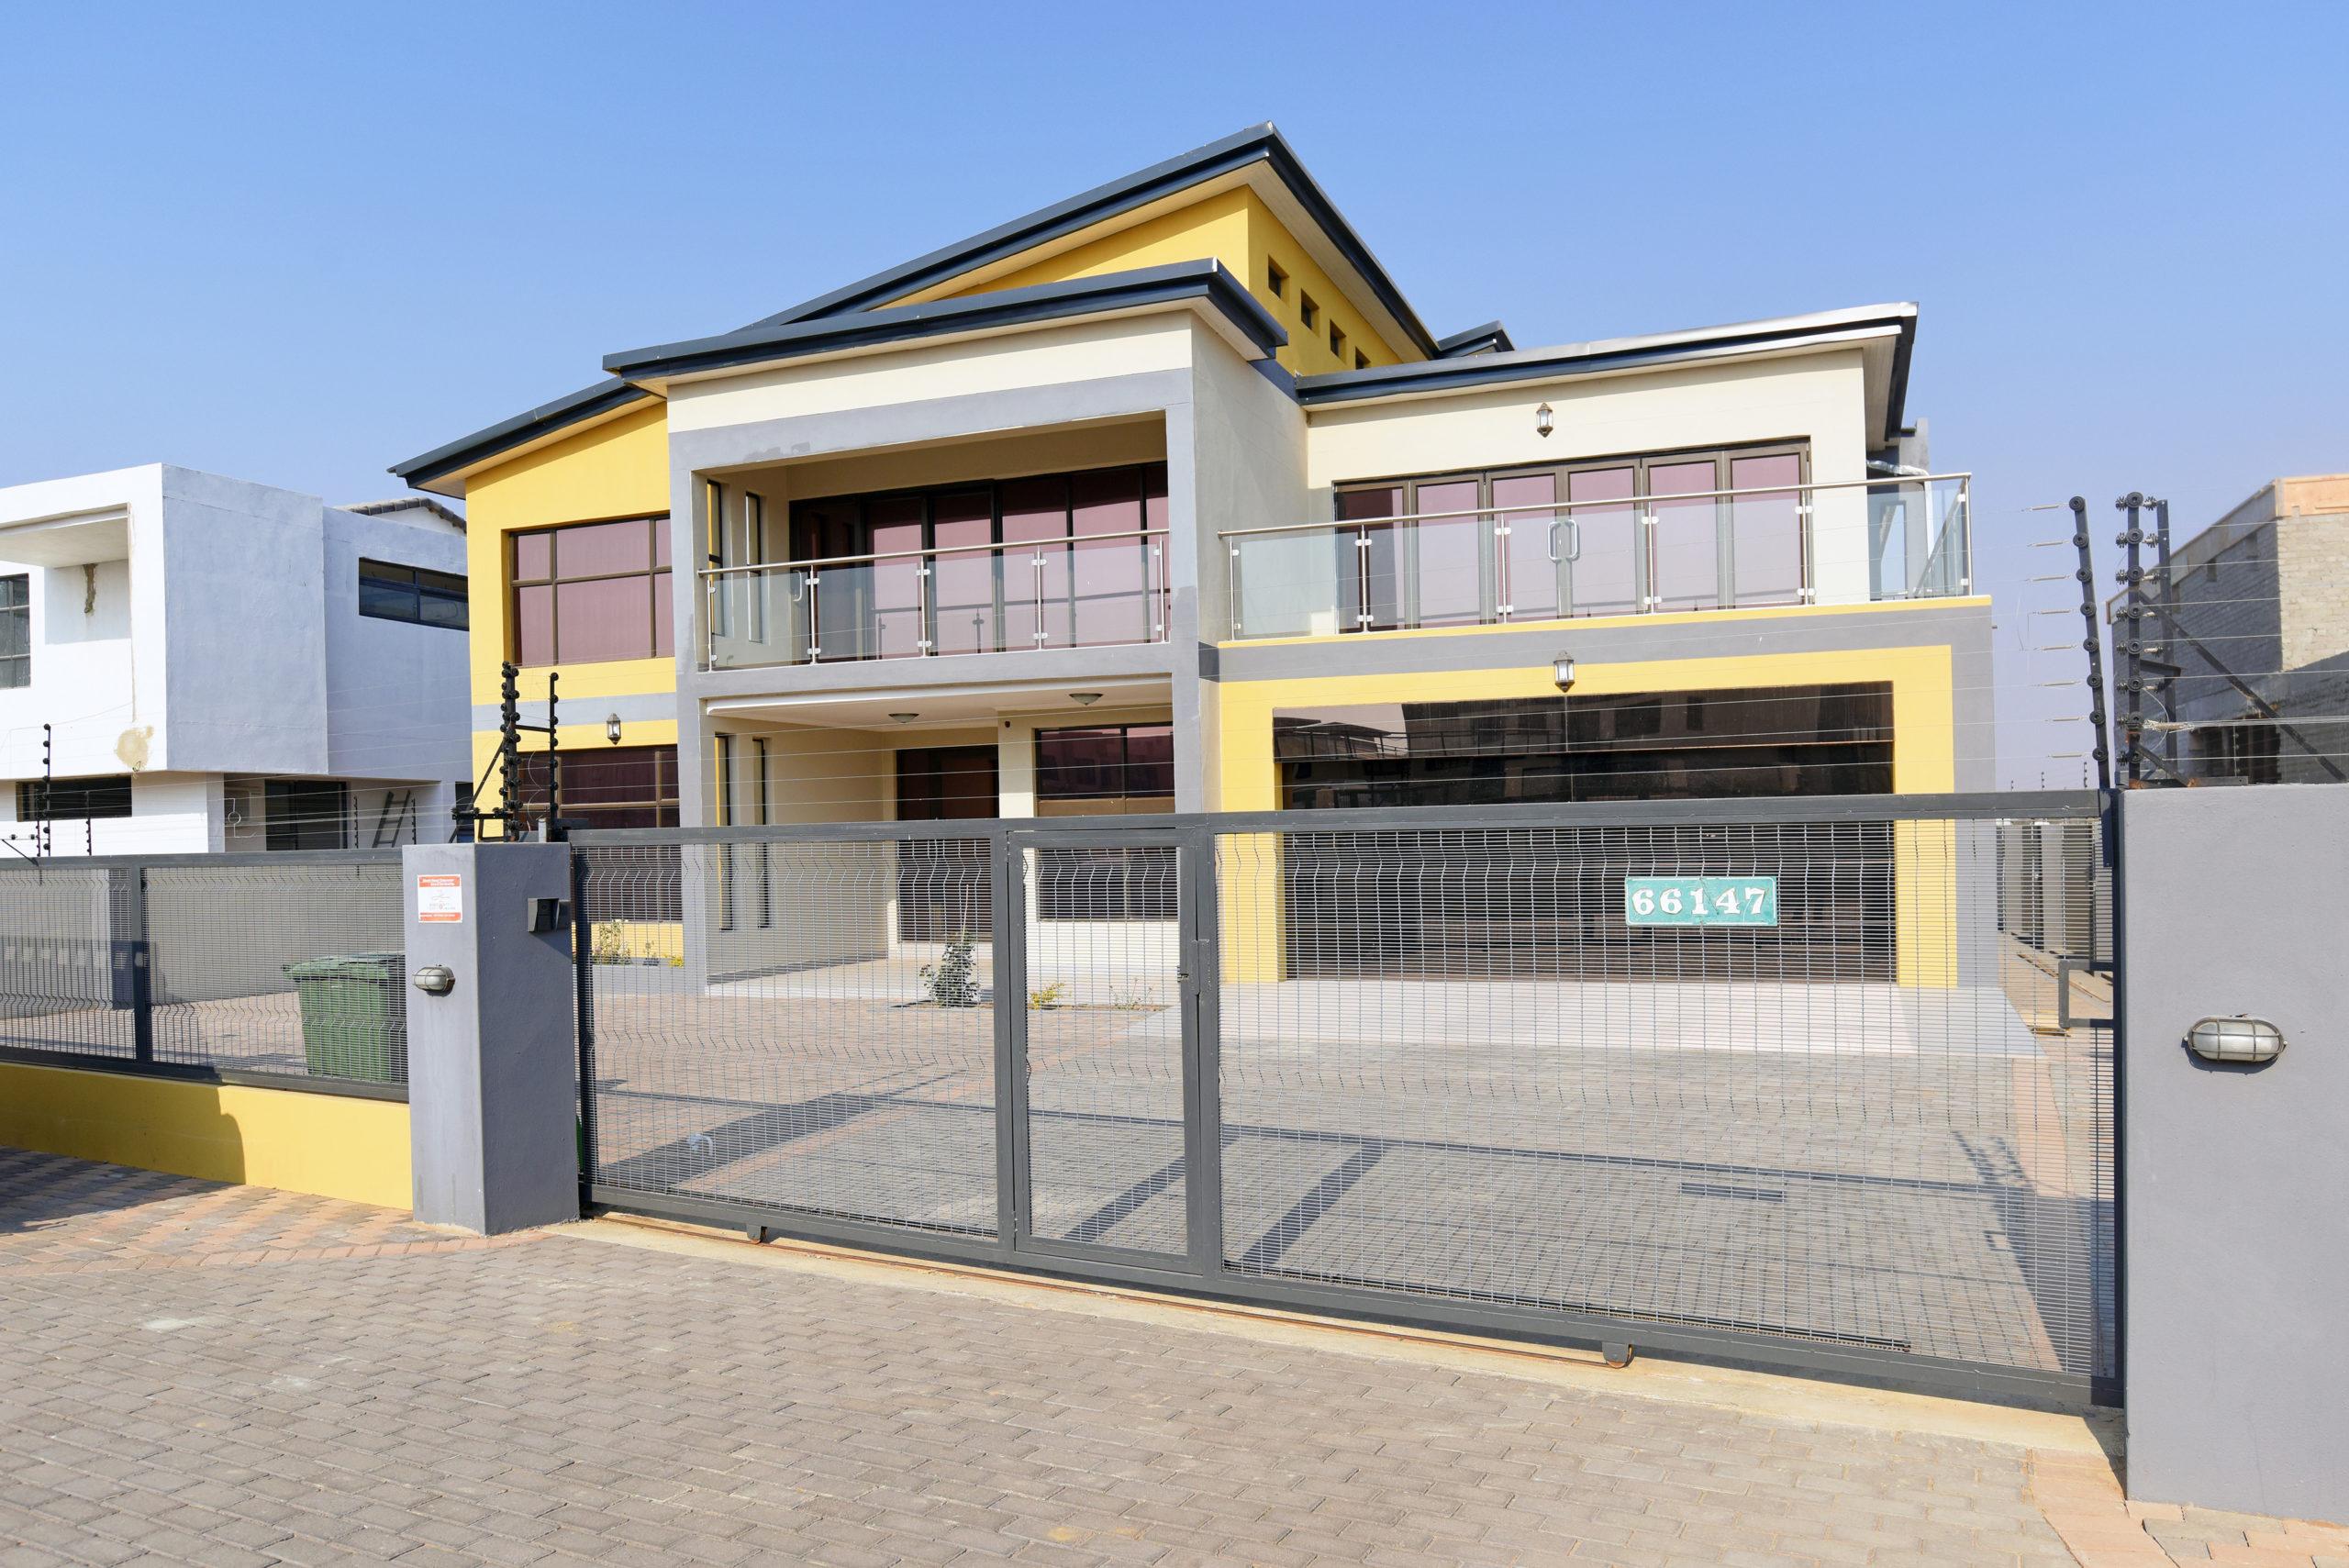 5 Bedroom House For Rent In Sethloa Village